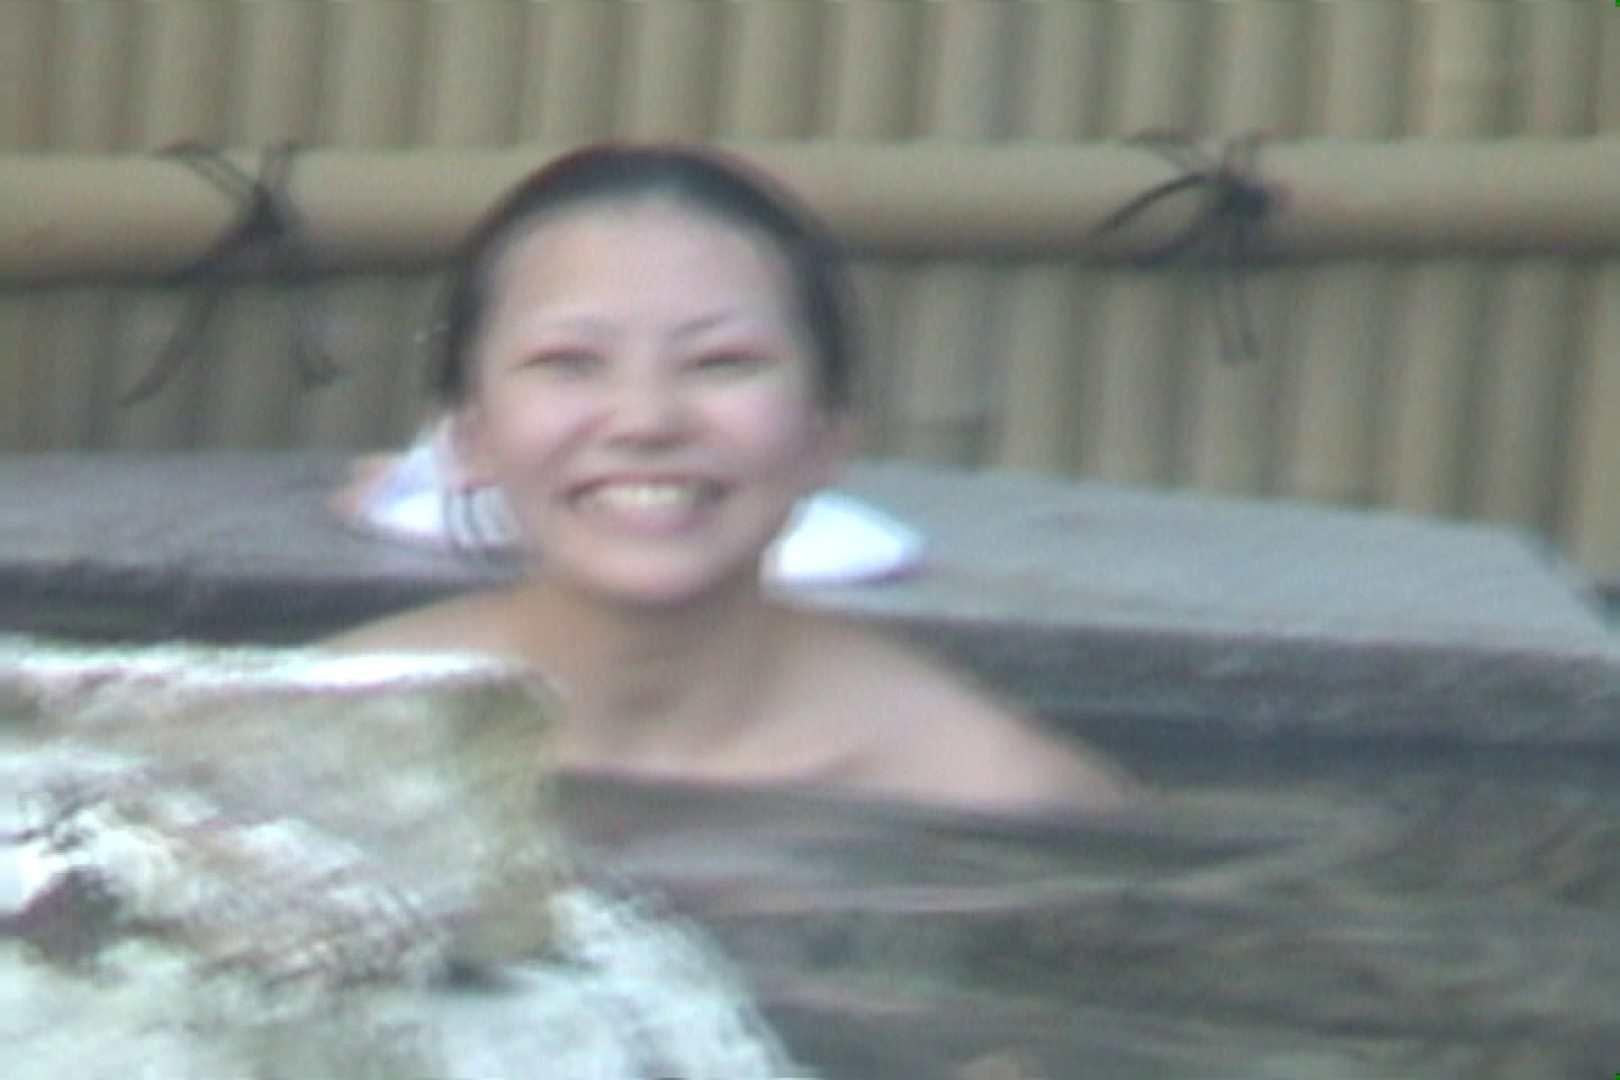 Aquaな露天風呂Vol.572 盗撮 | OLエロ画像  67PICs 25